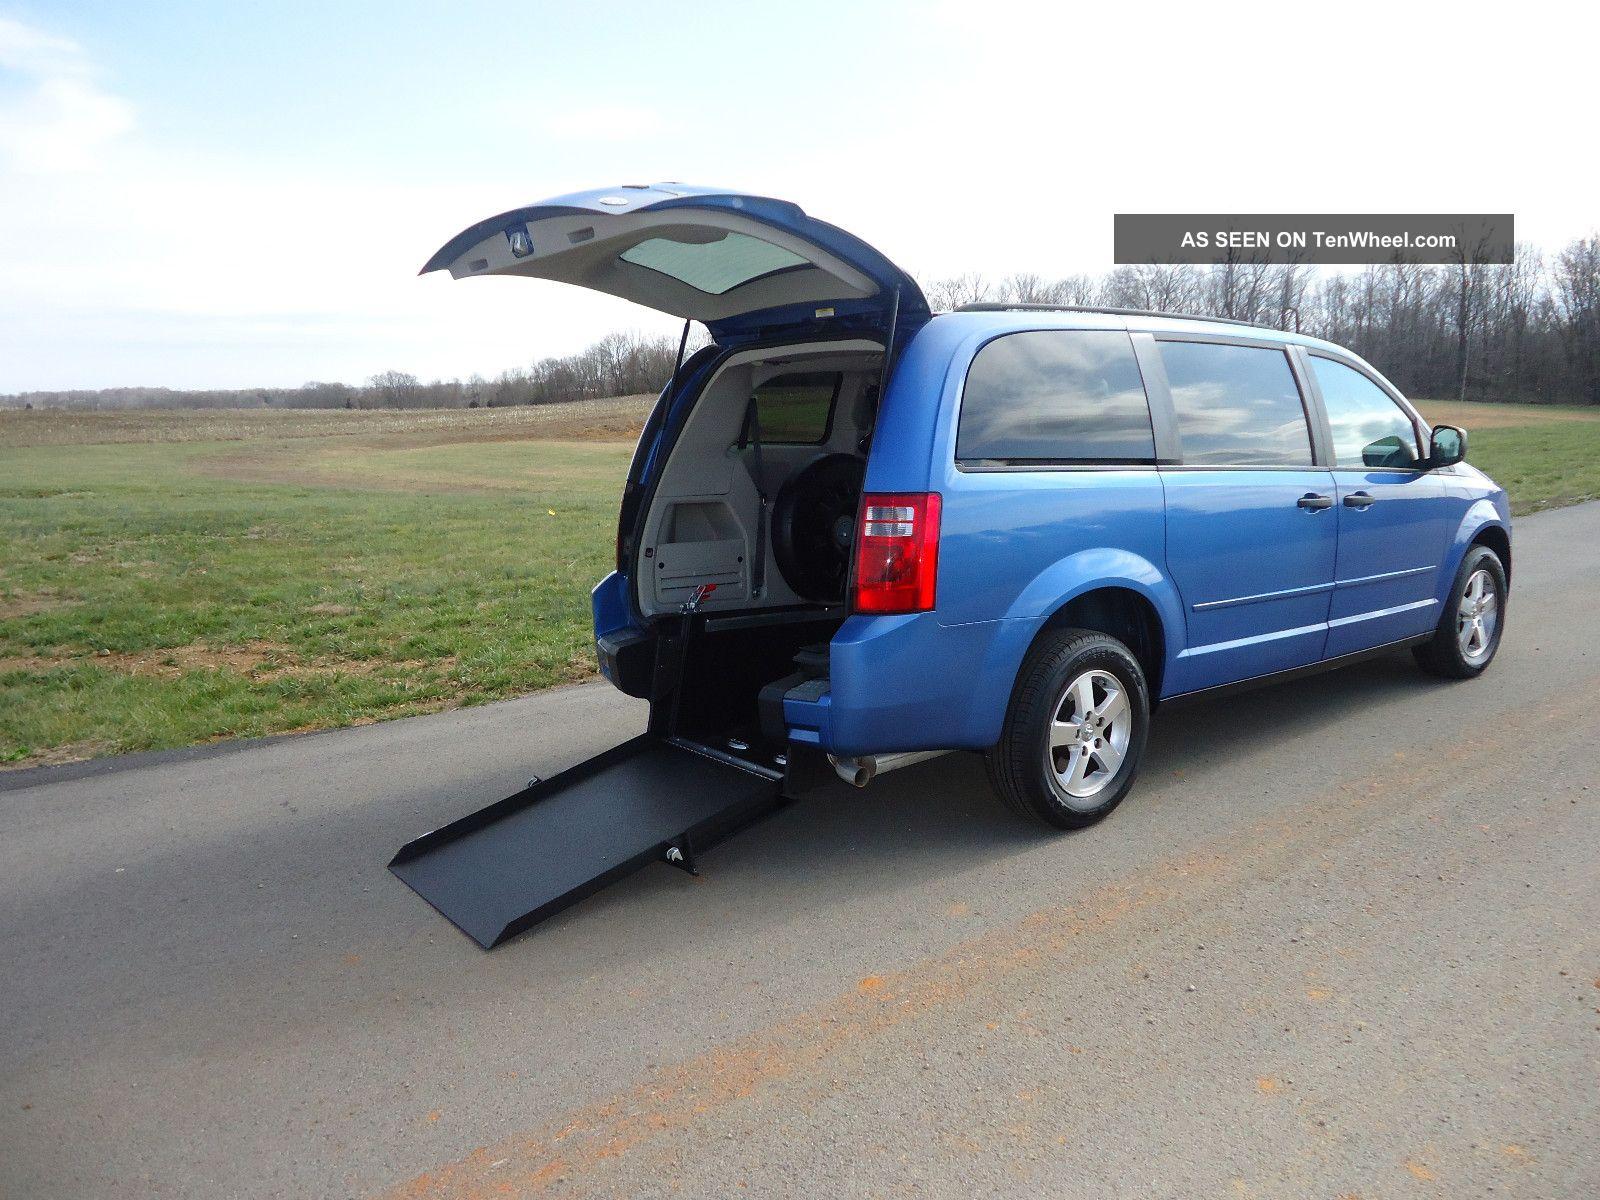 2008 Dodge Grand Caravan Wheelchair / Handicap Ramp Van Rear Entry Conversion Grand Caravan photo